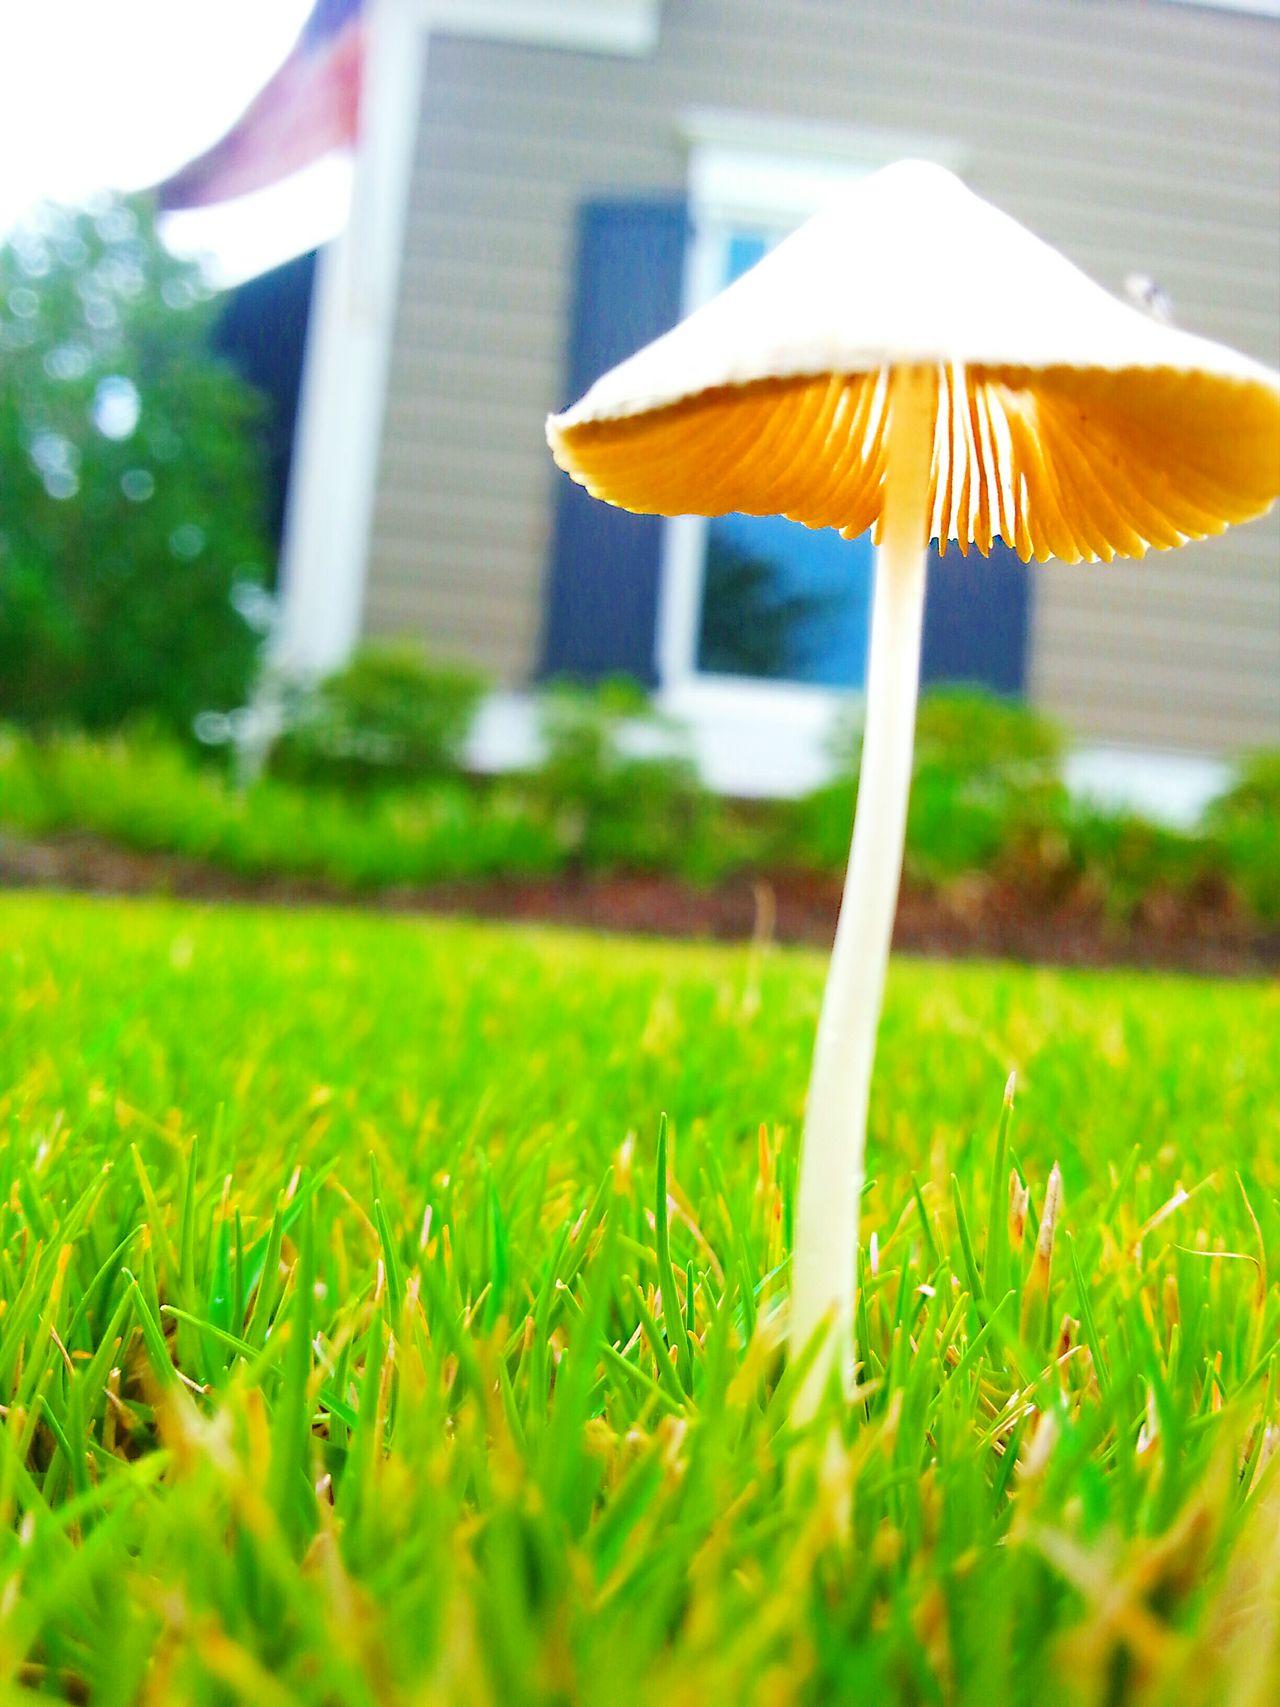 Mushroomphotography Mushrooms Shrooms Non-urban Scene No People Extreme Close Up Shroom Fungus 🍄 Fungi Magic Forest Mushrooms